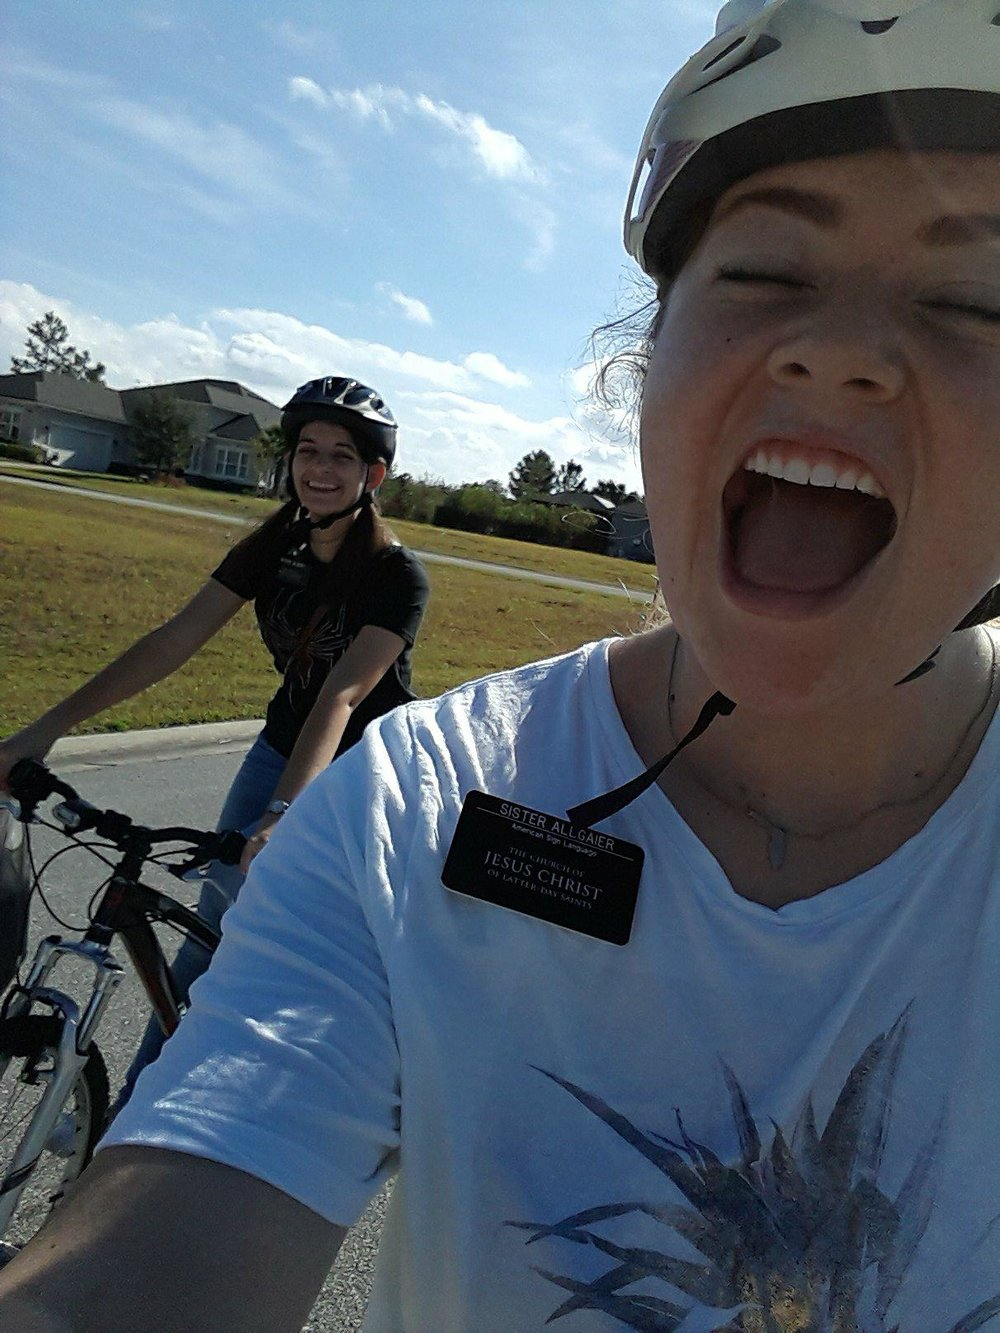 Bike riding in PANTS!!!!